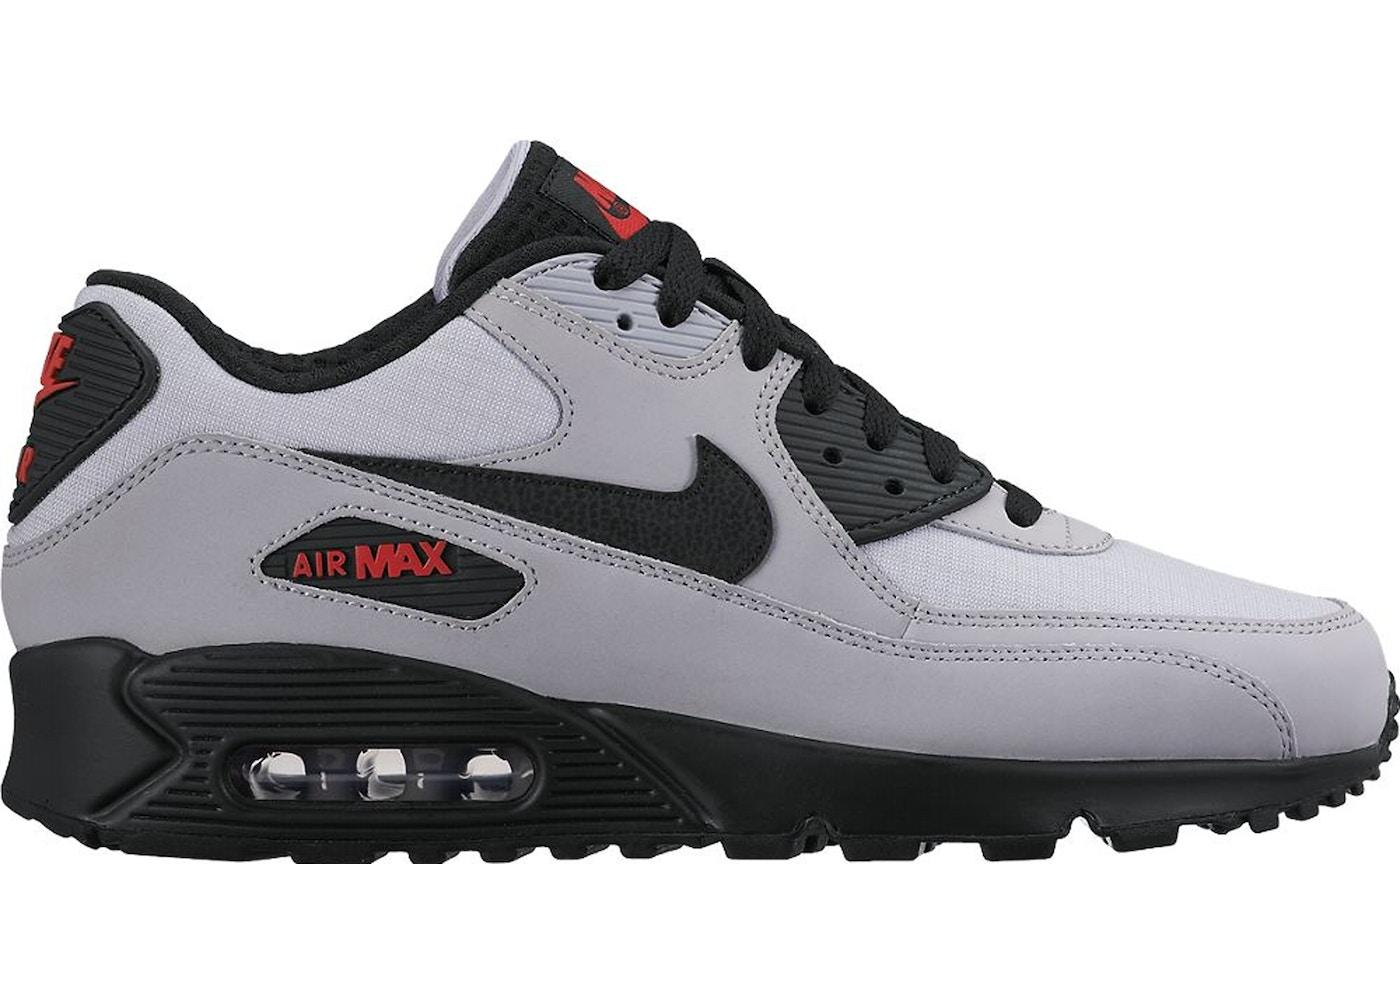 4f5635b07 Buy Nike Air Max 90 Shoes & Deadstock Sneakers